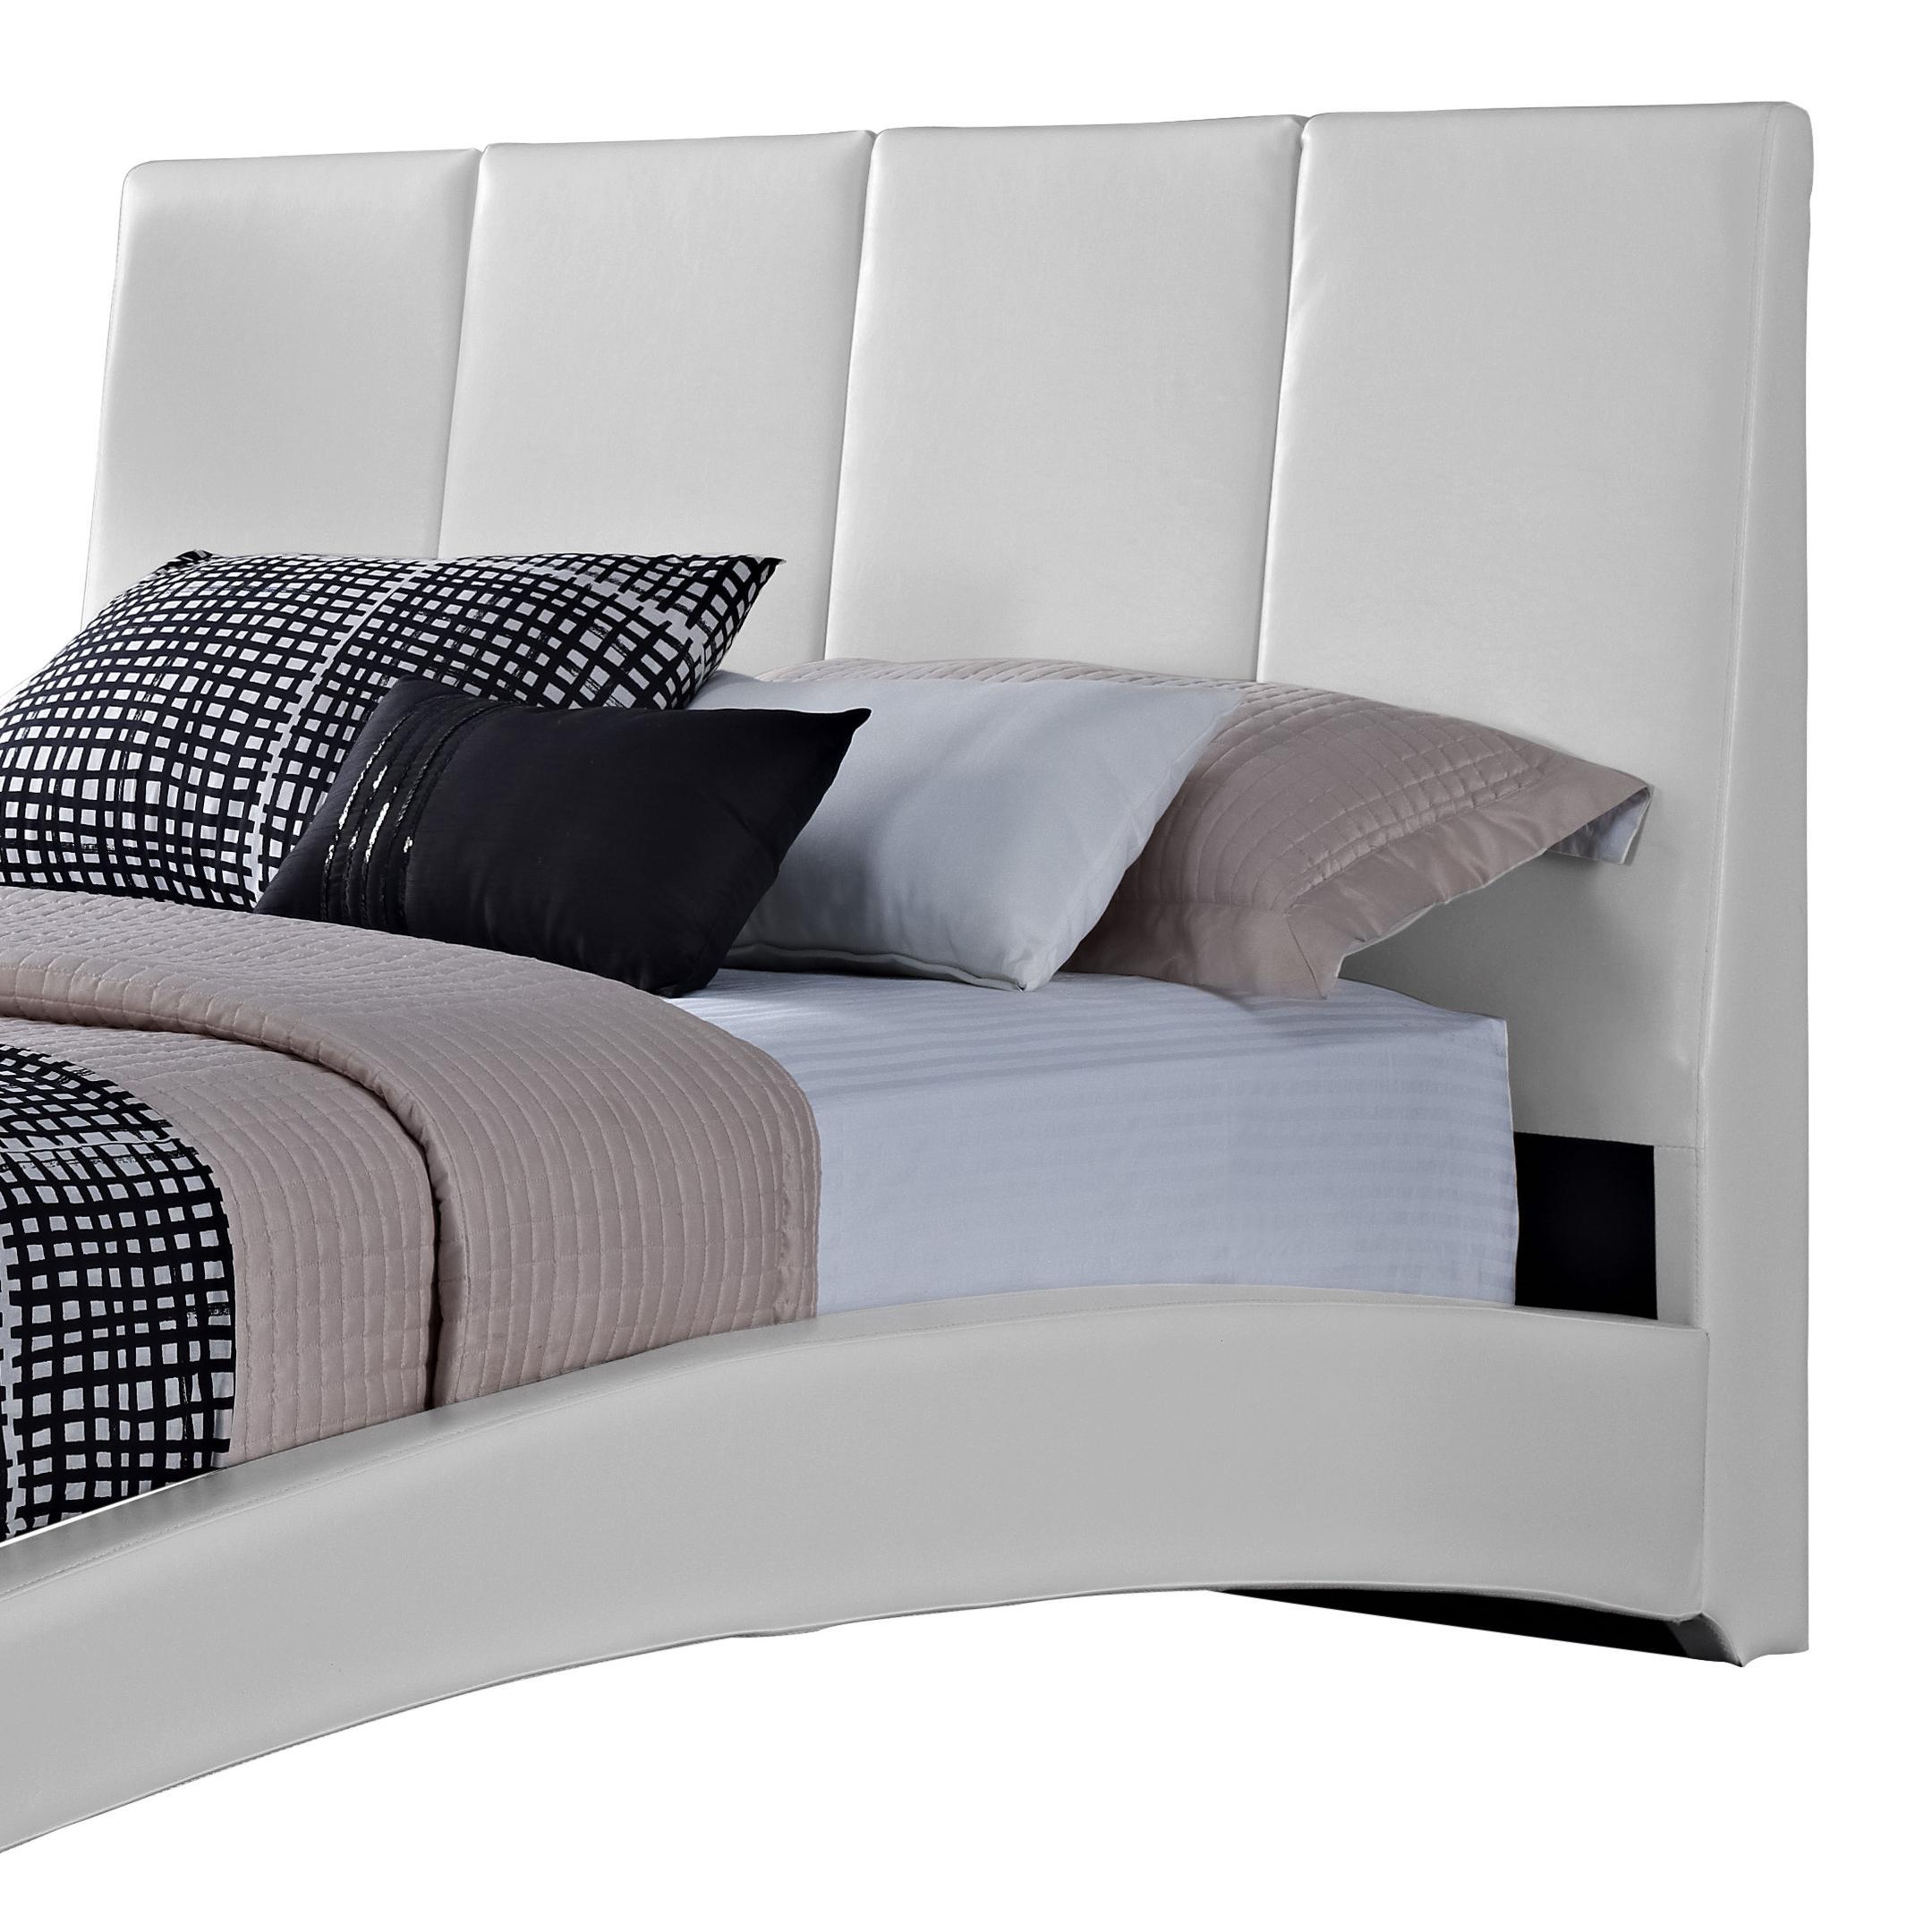 Standard Furniture Moderno  Queen Upholstered Headboard - Item Number: 99507